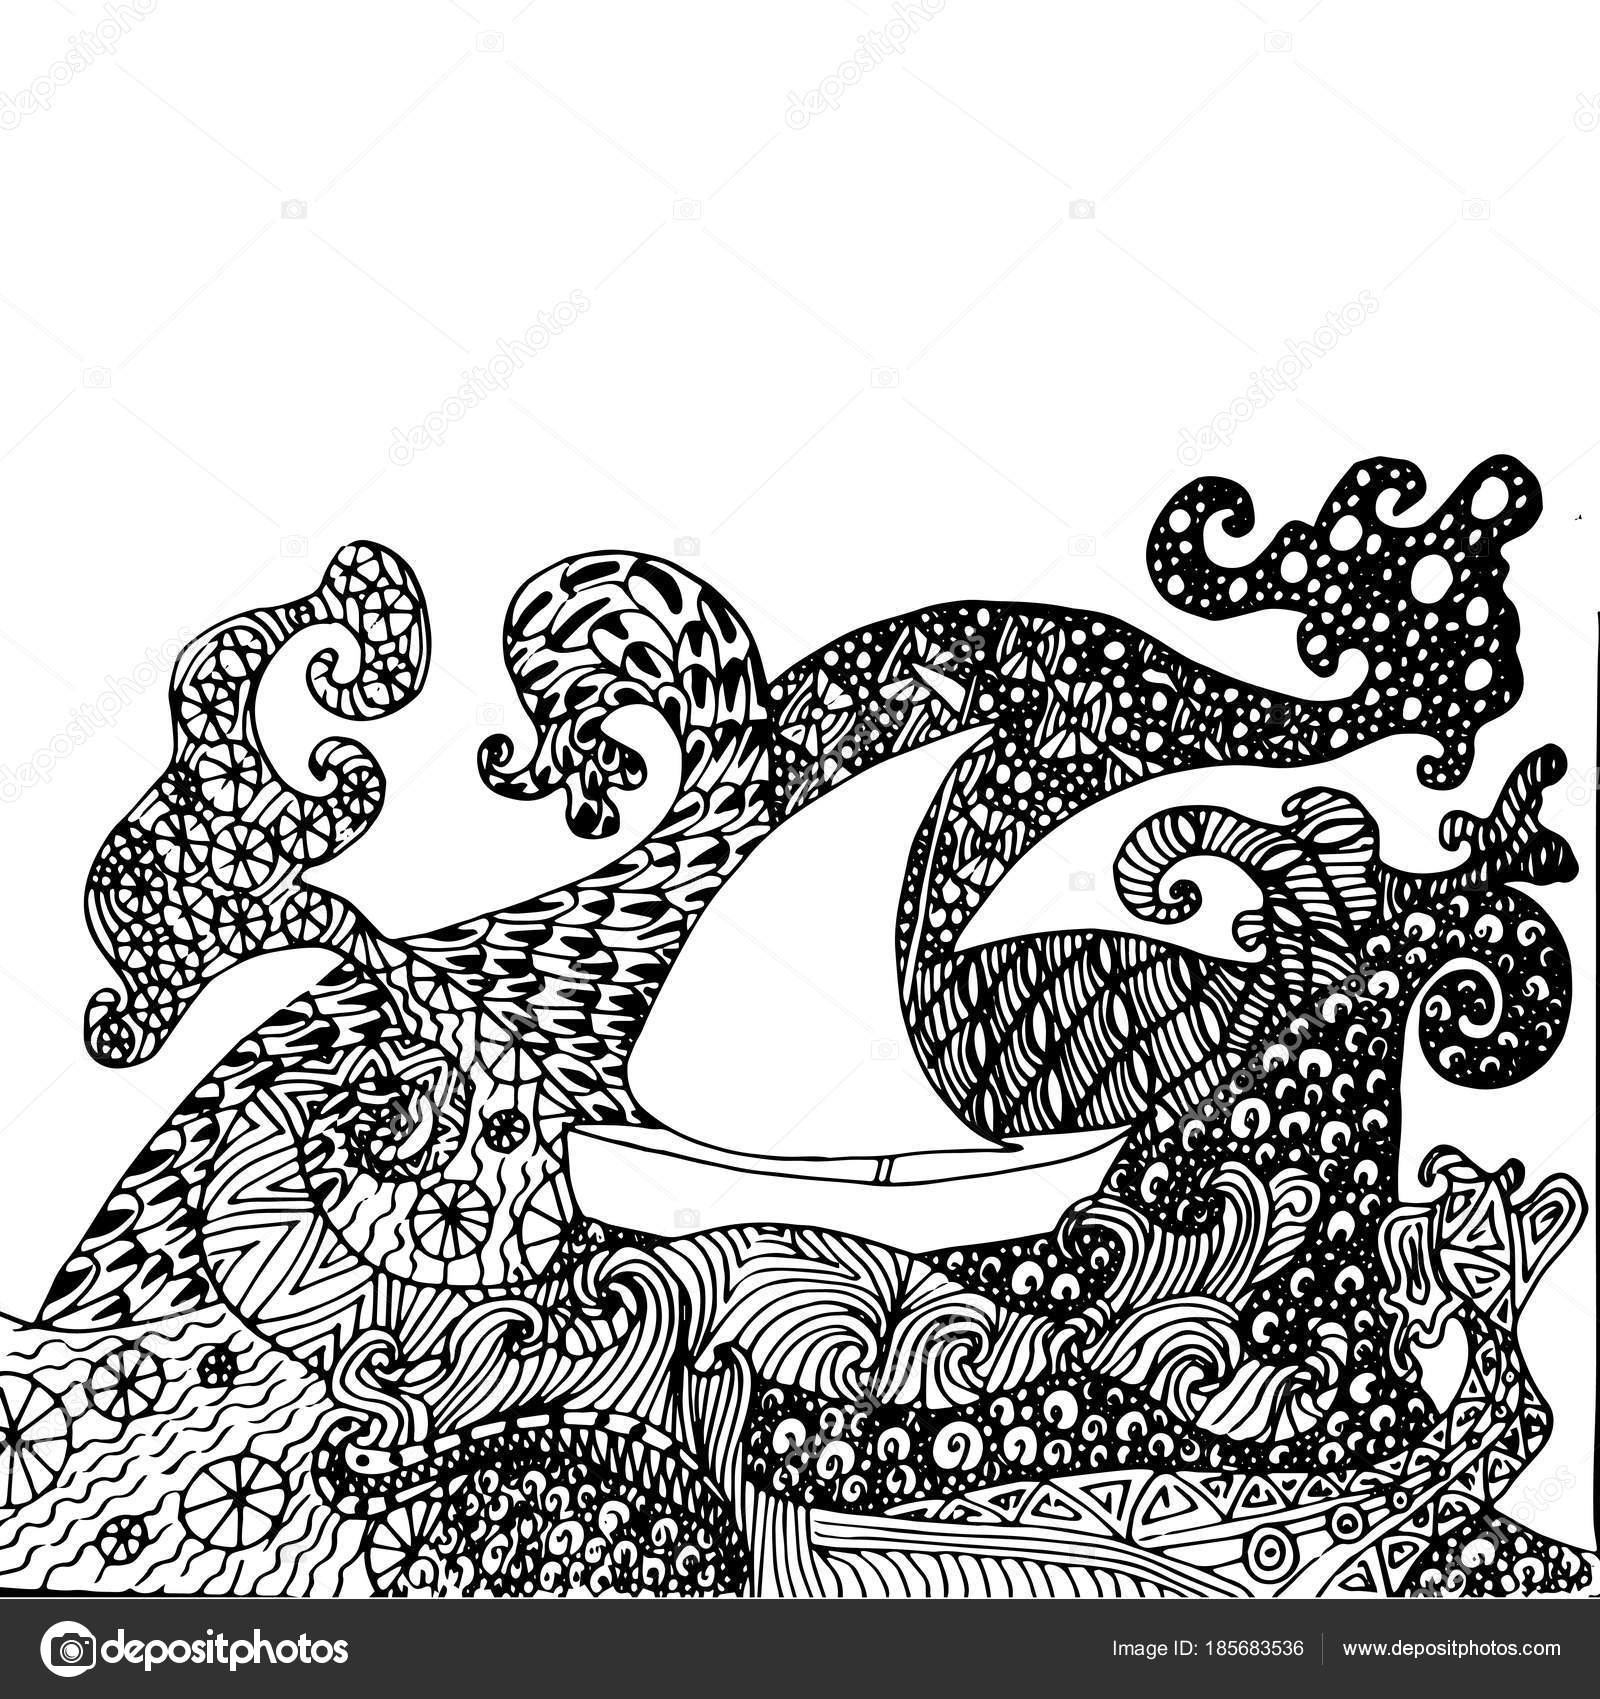 Nave Zentangle Dibujado Mano Antiestrés Olas Para Colorear